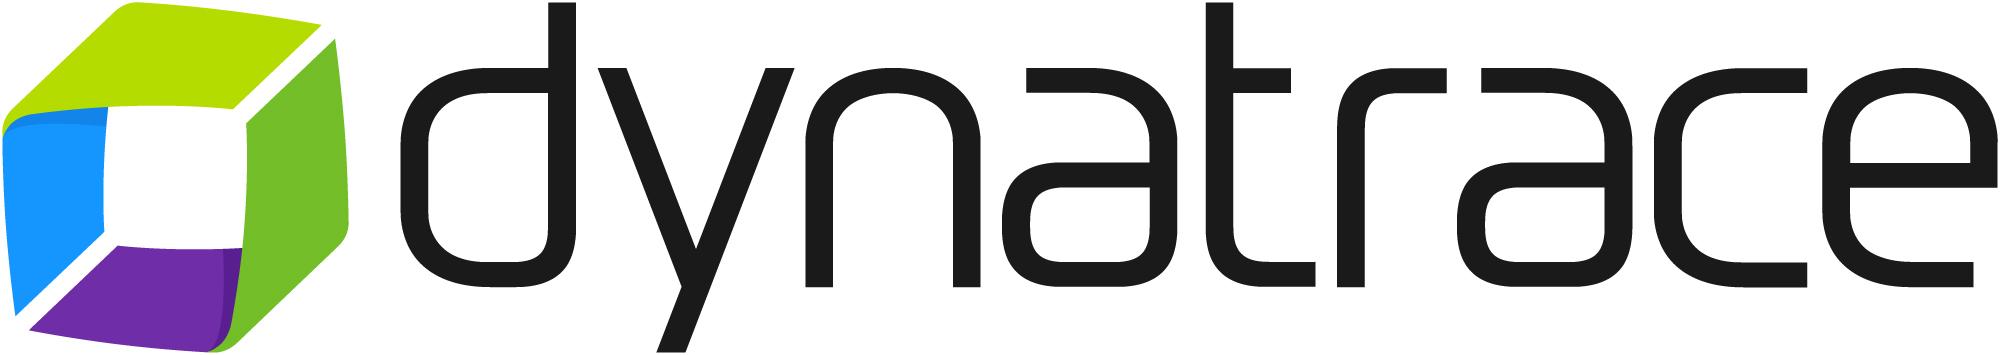 Dynatrace Case Study – Amazon Web Services (AWS)